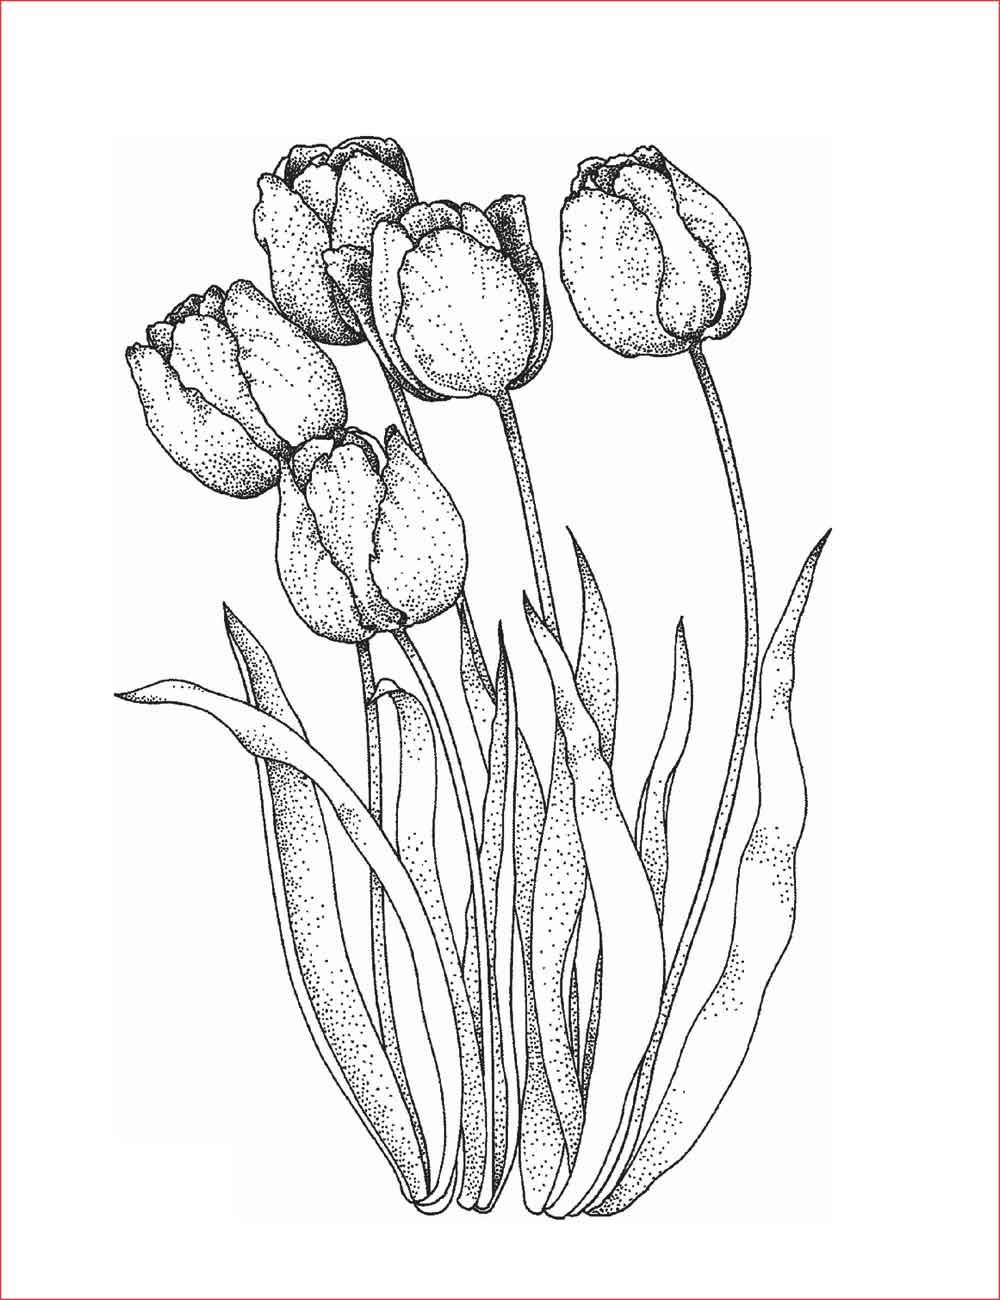 30 Gambar Sketsa Bunga Mudah Bunga Matahari Mawar Tulip